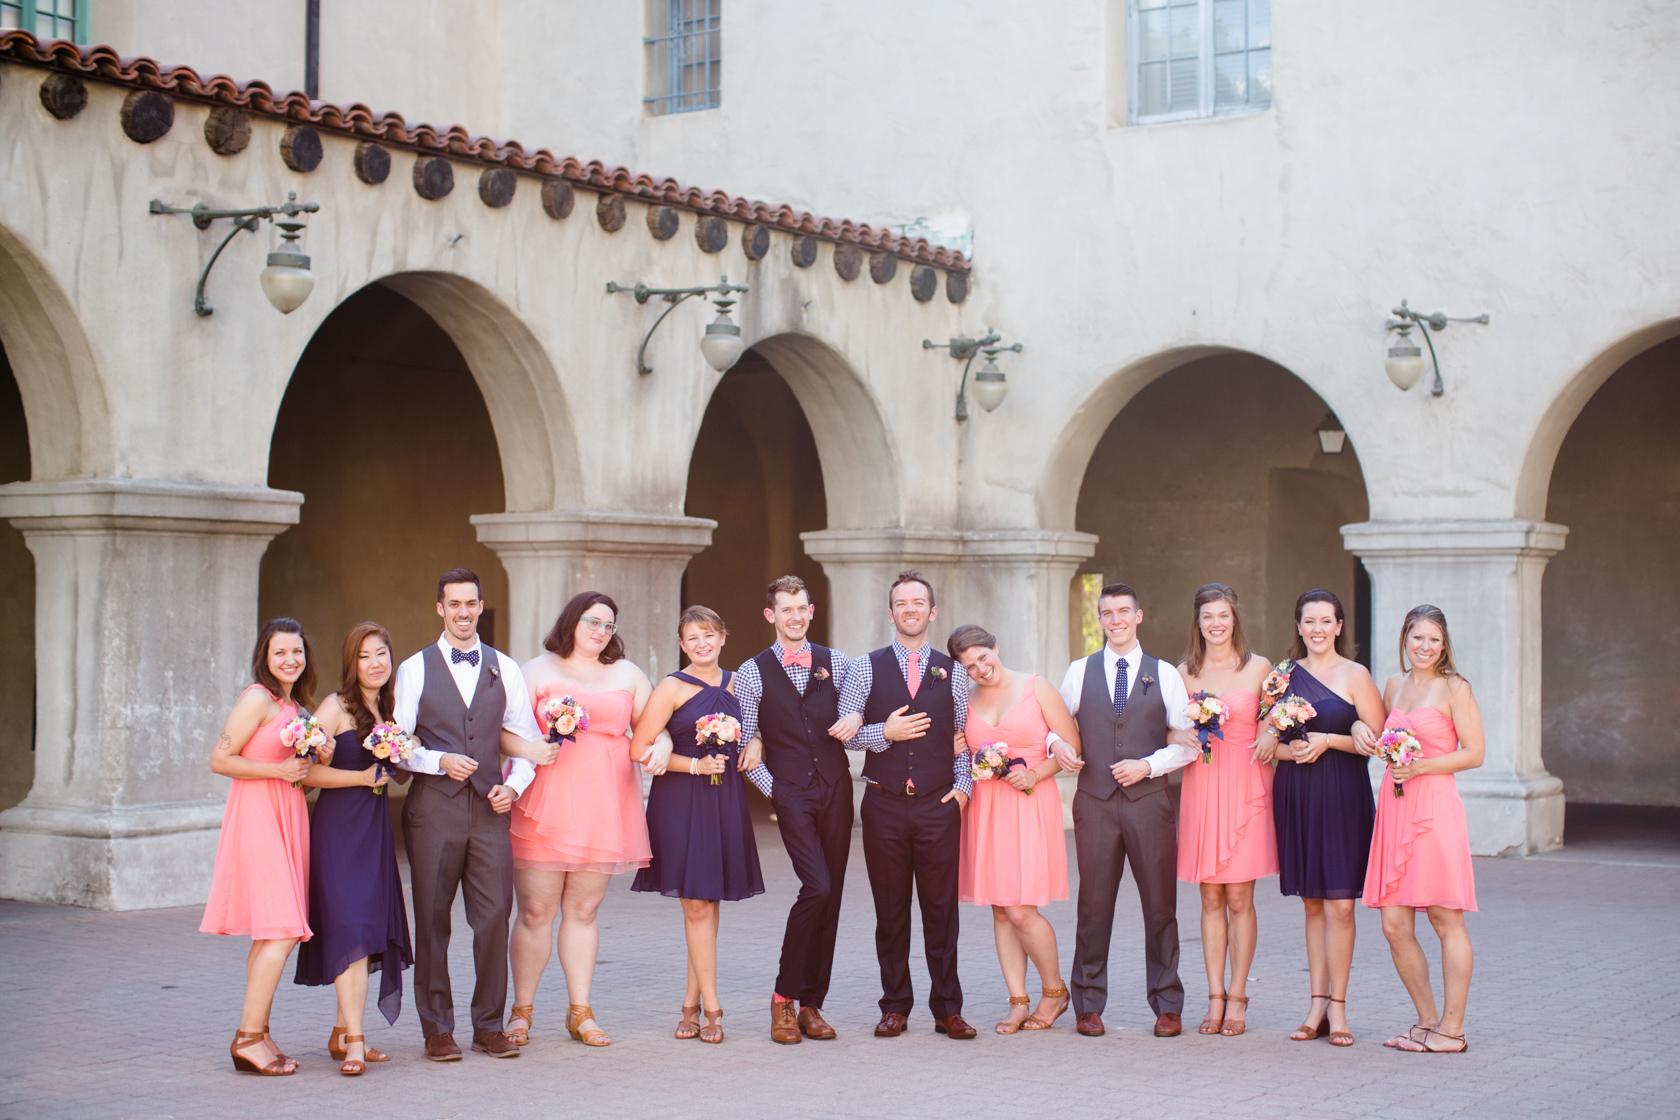 Balboa_Park_Wedding_042.jpg